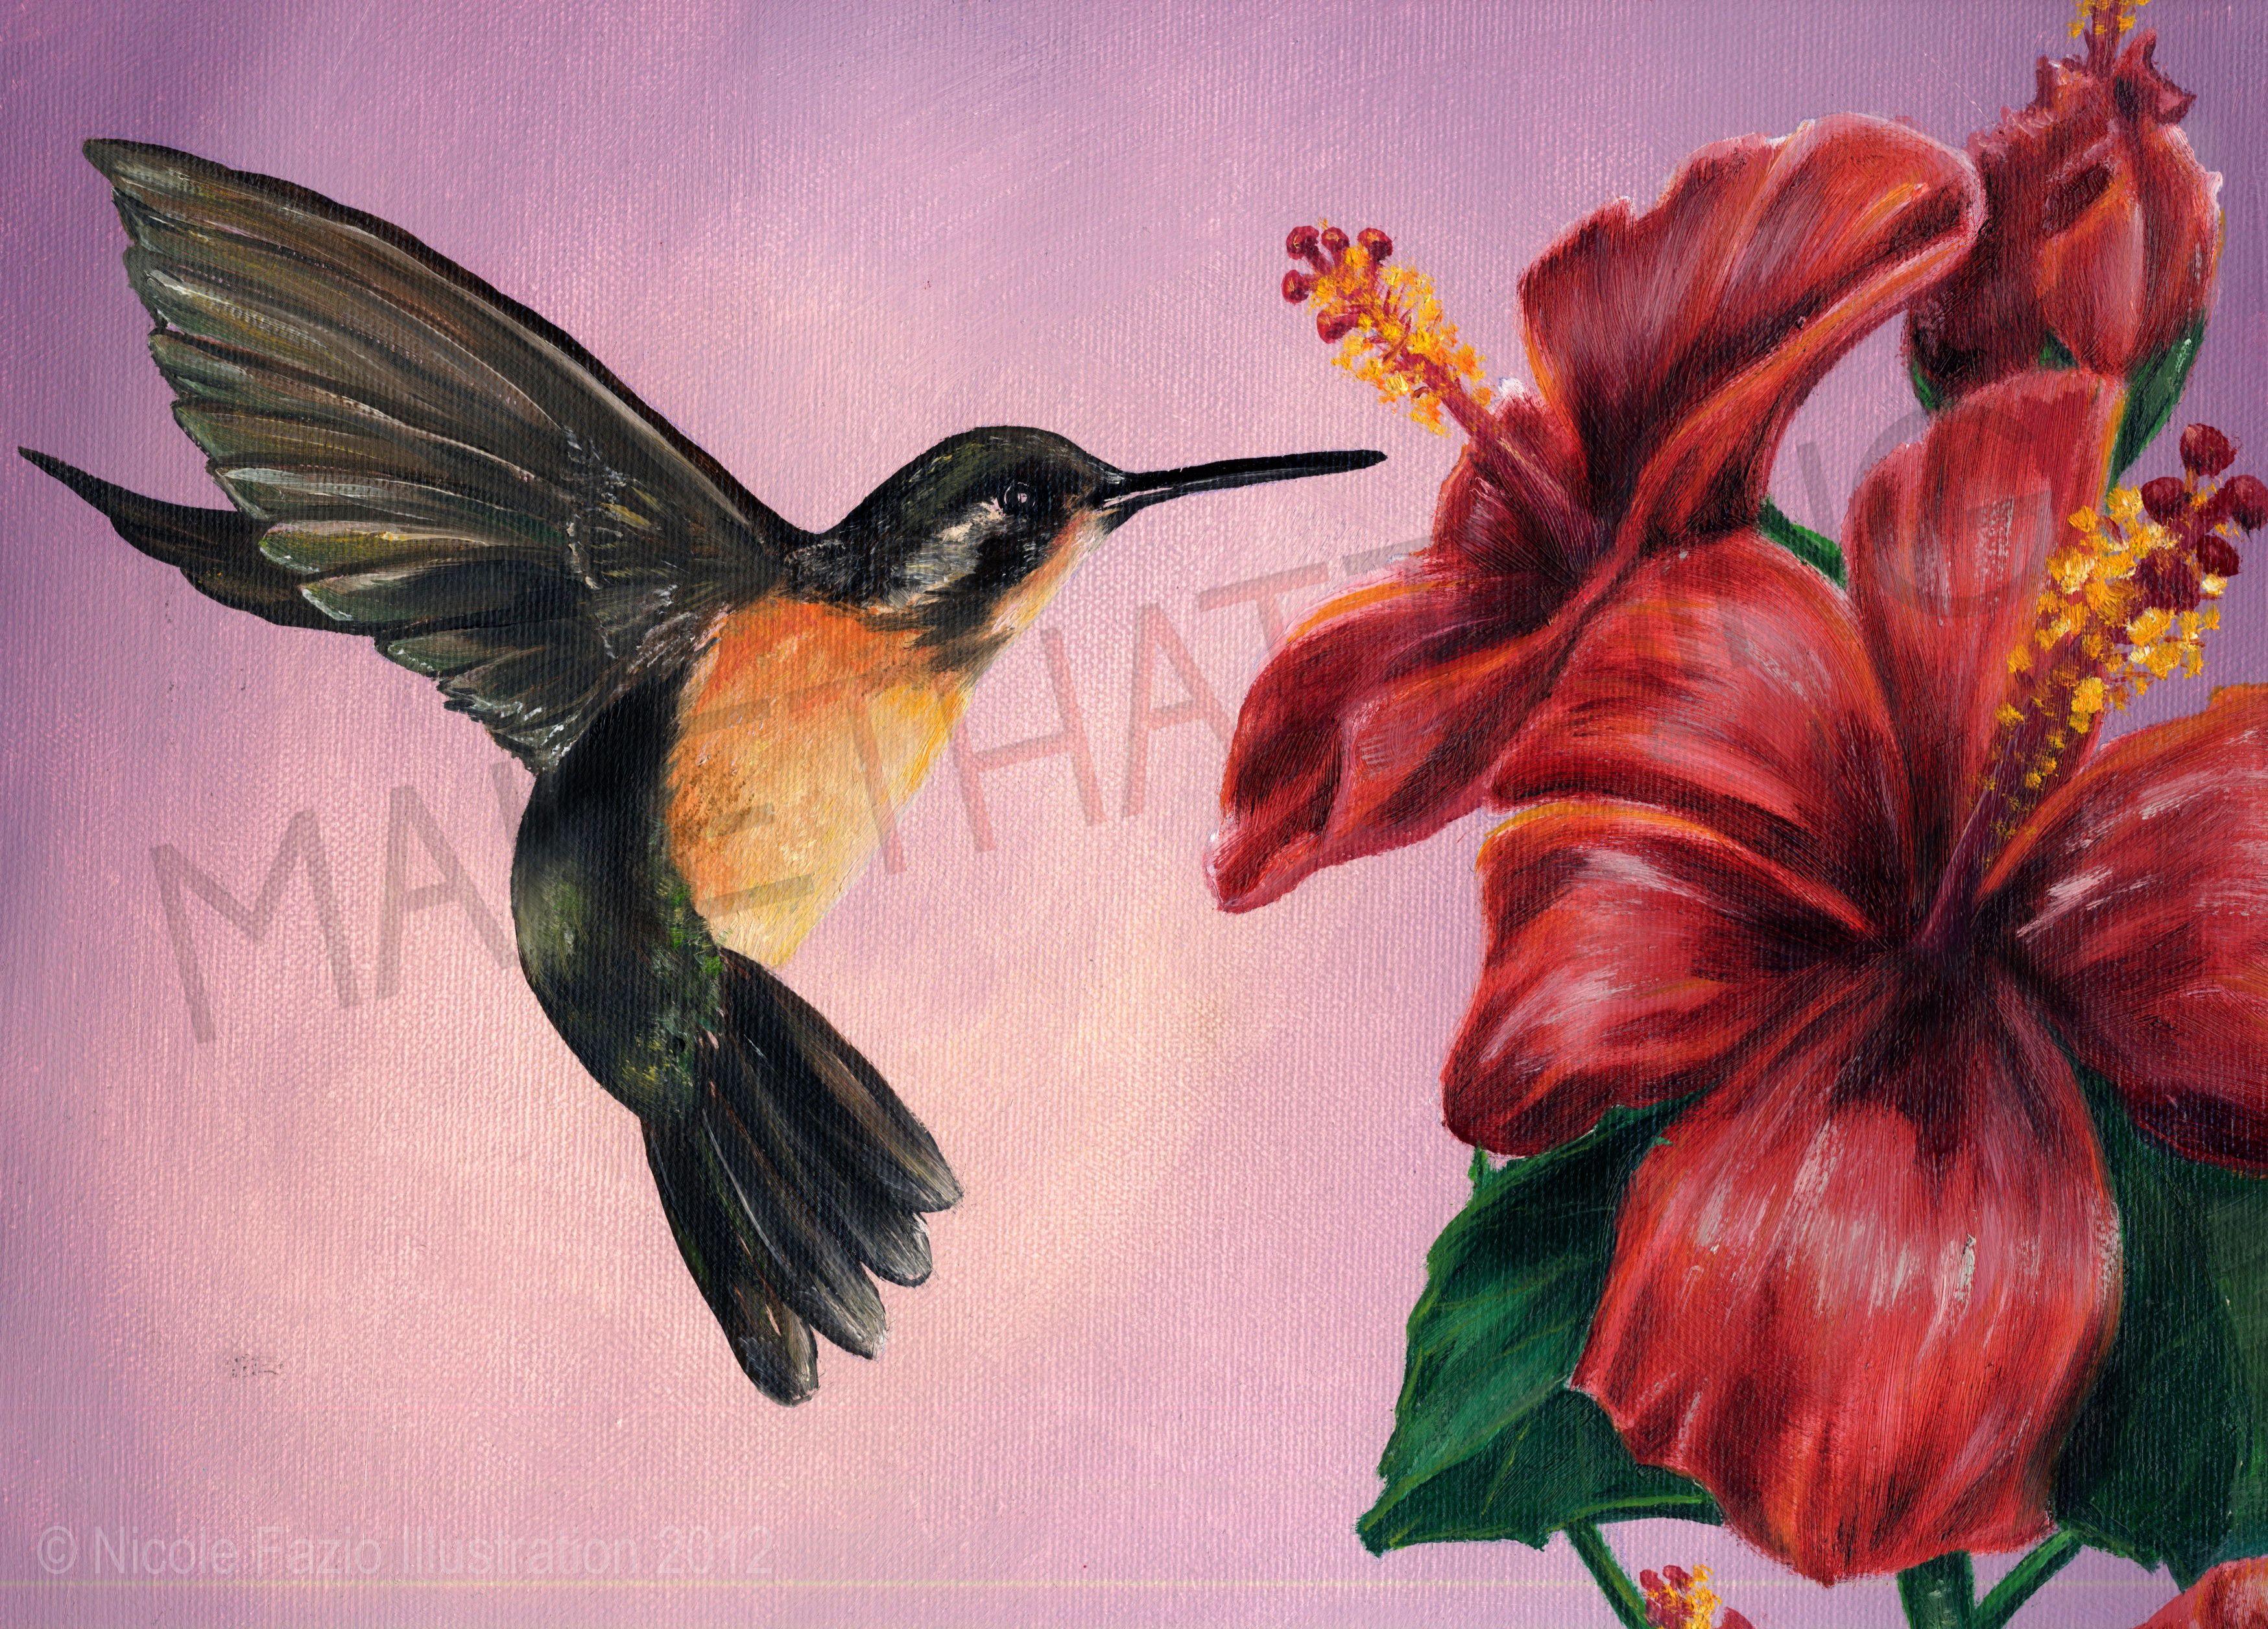 Hummingbird Oil Painting | Hummingbird, Paintings and ...